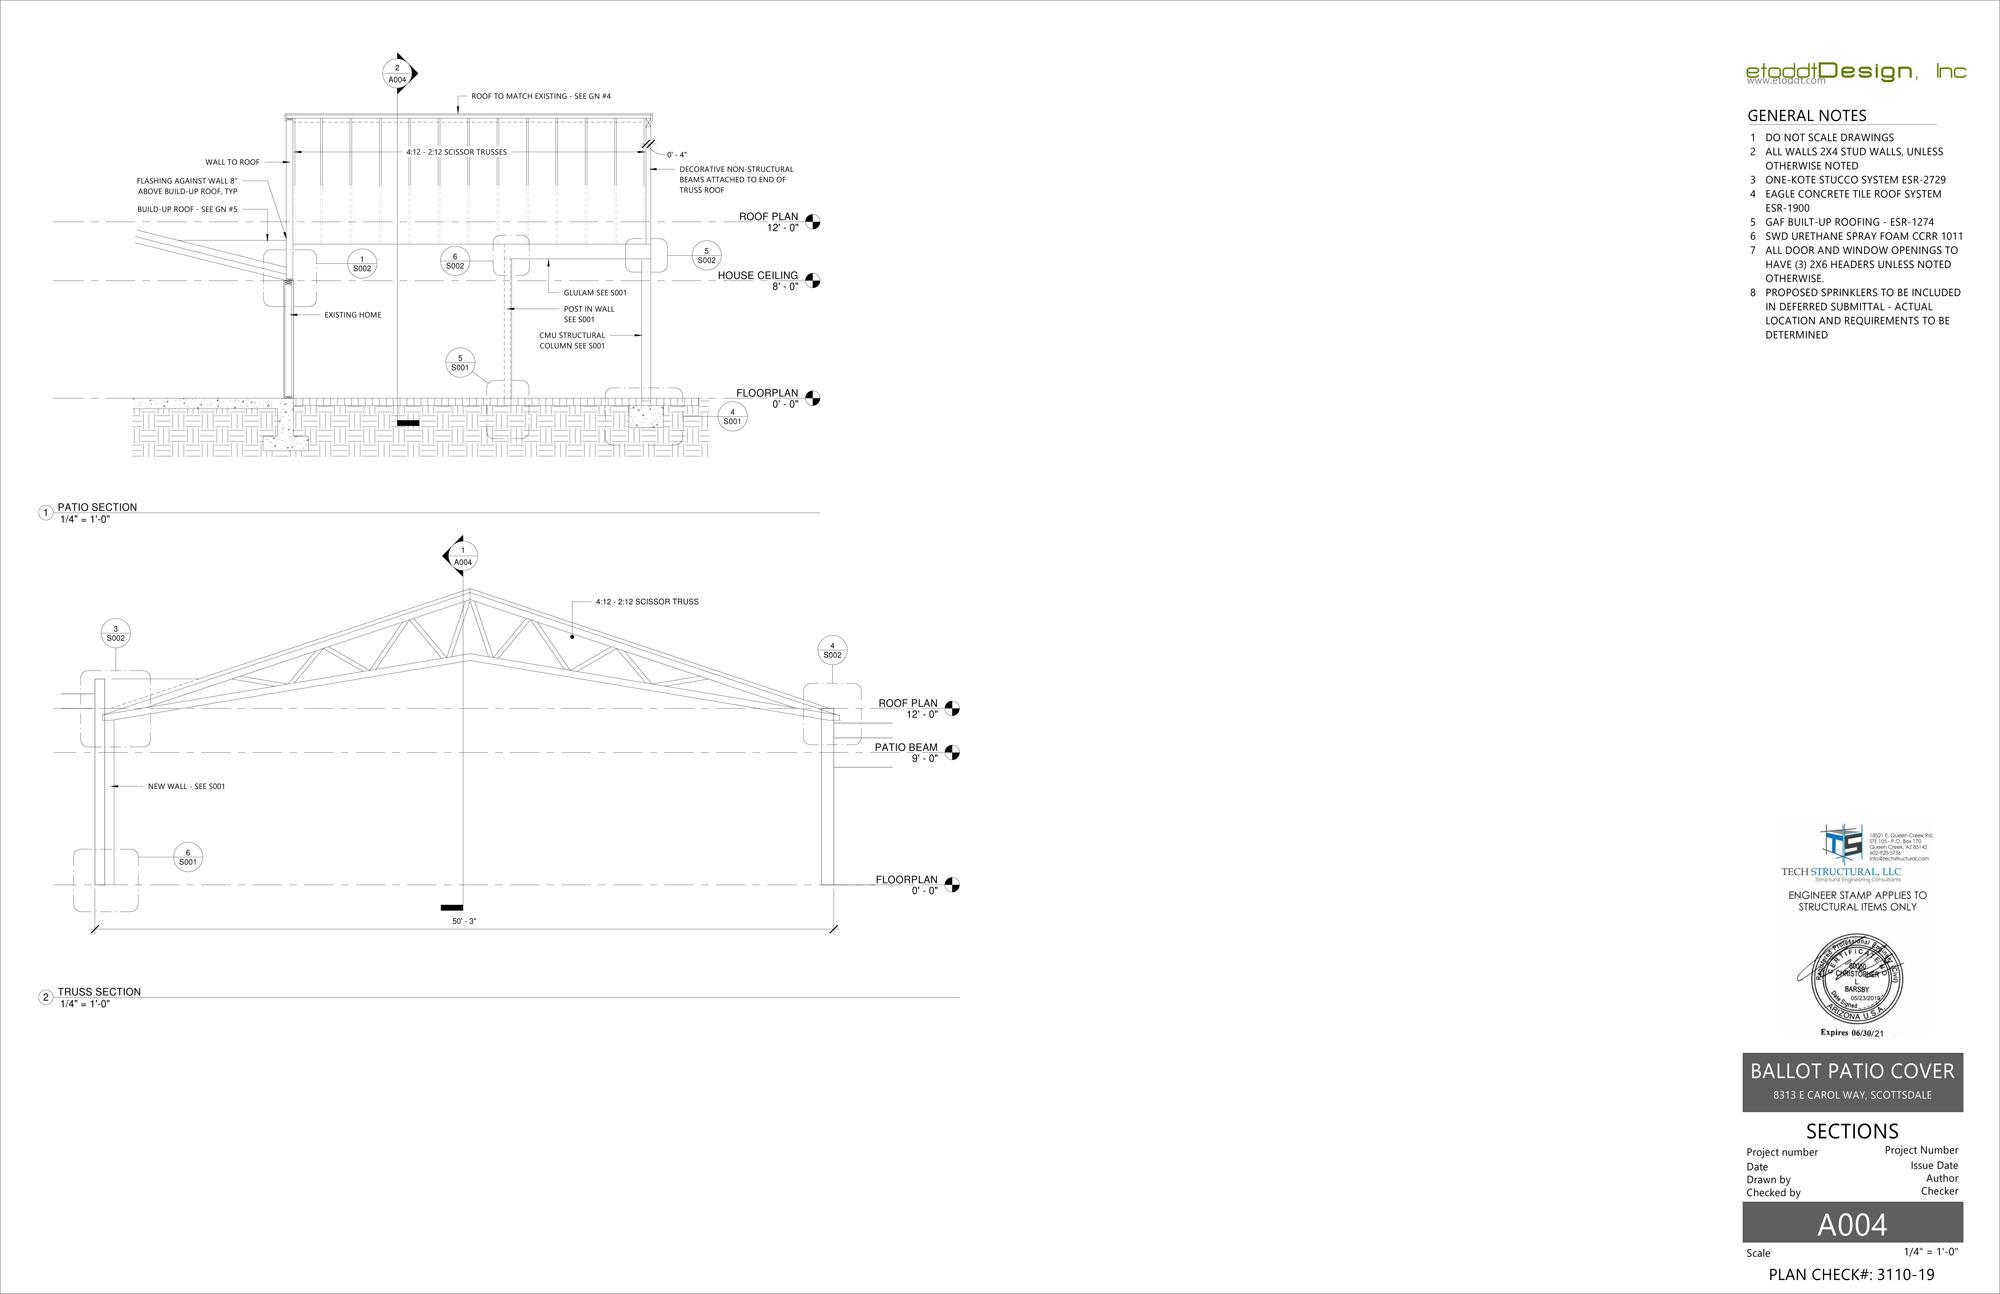 Ballot_patio_4-12_truss_LAYOUT-2